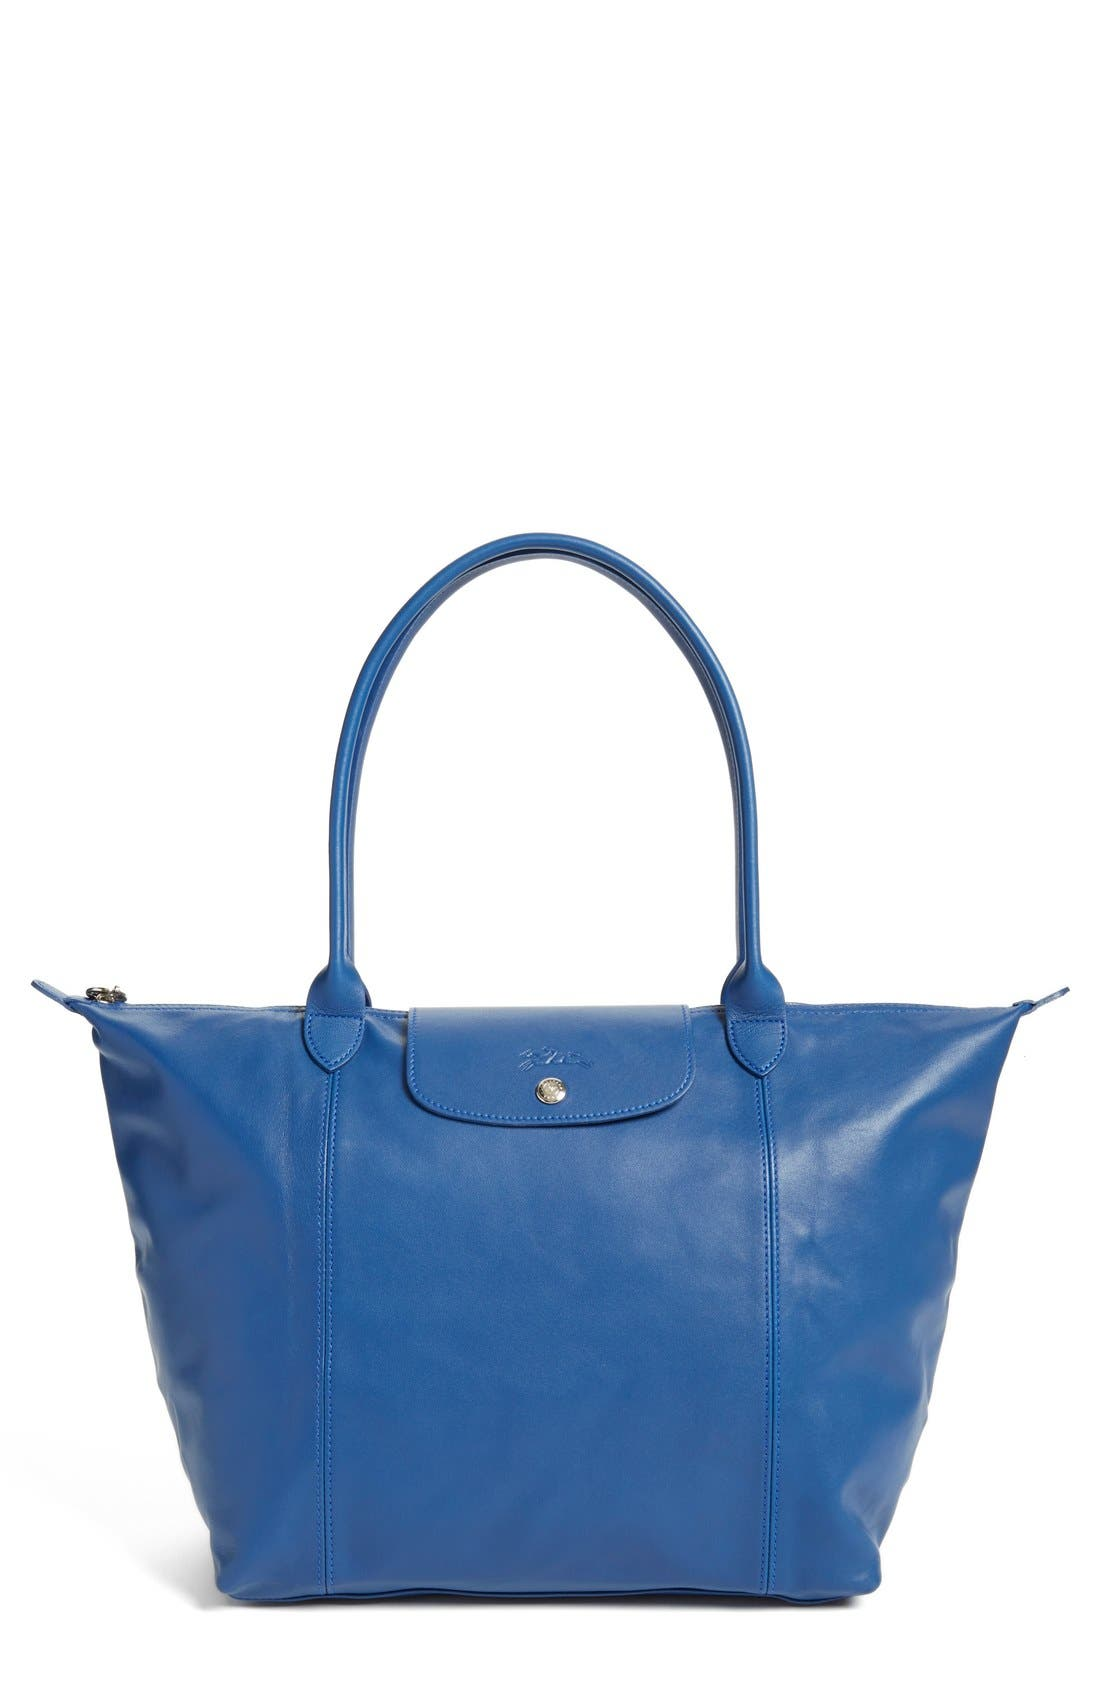 Main Image - Longchamp 'Le Pliage Cuir' Leather Tote